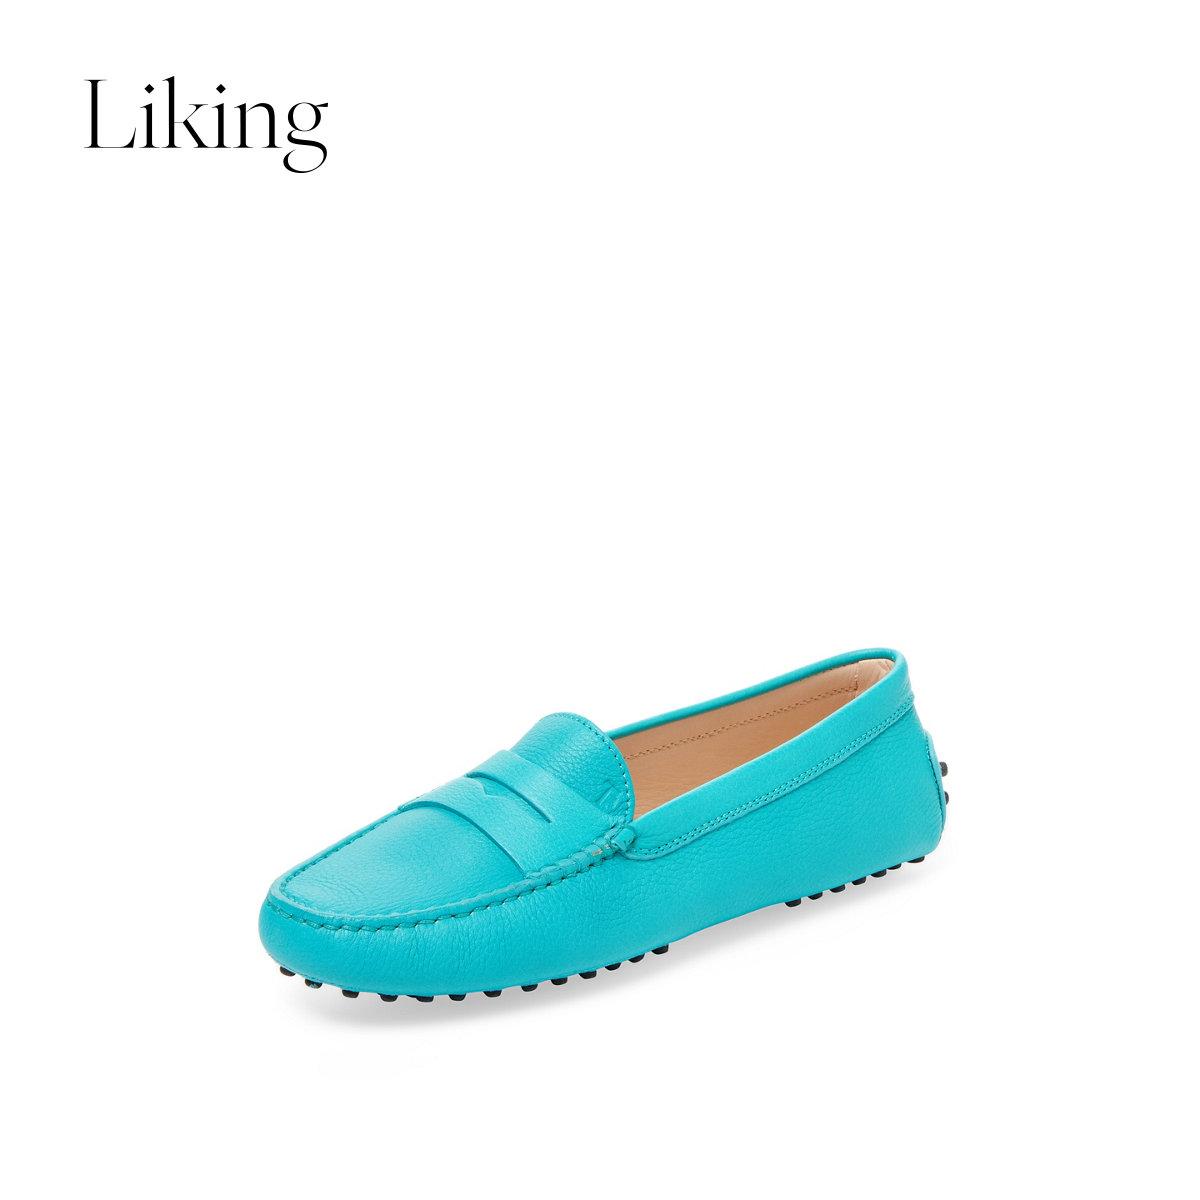 tods豆豆鞋 tods 女士乐福鞋豆豆鞋_推荐淘宝好看的女tods豆豆鞋